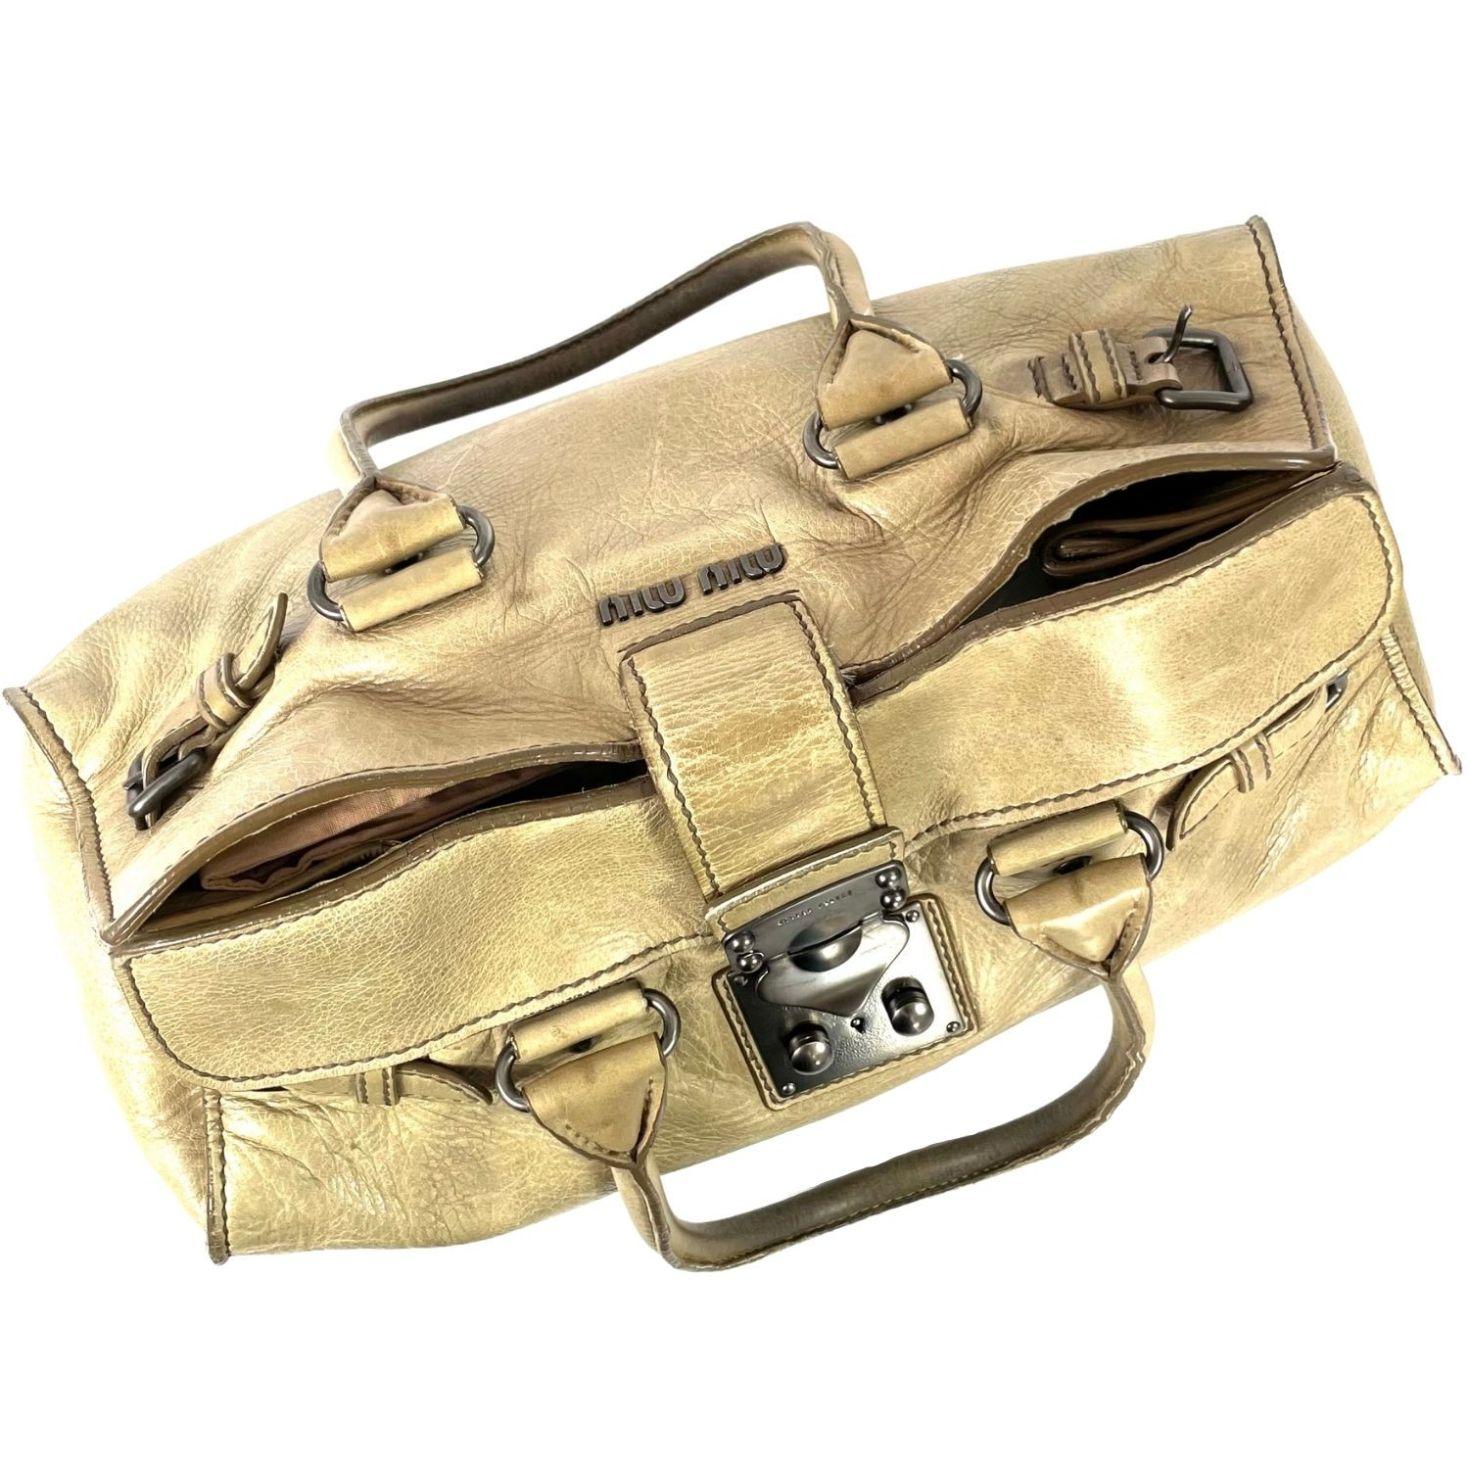 Bolsa Miu Miu Marfim